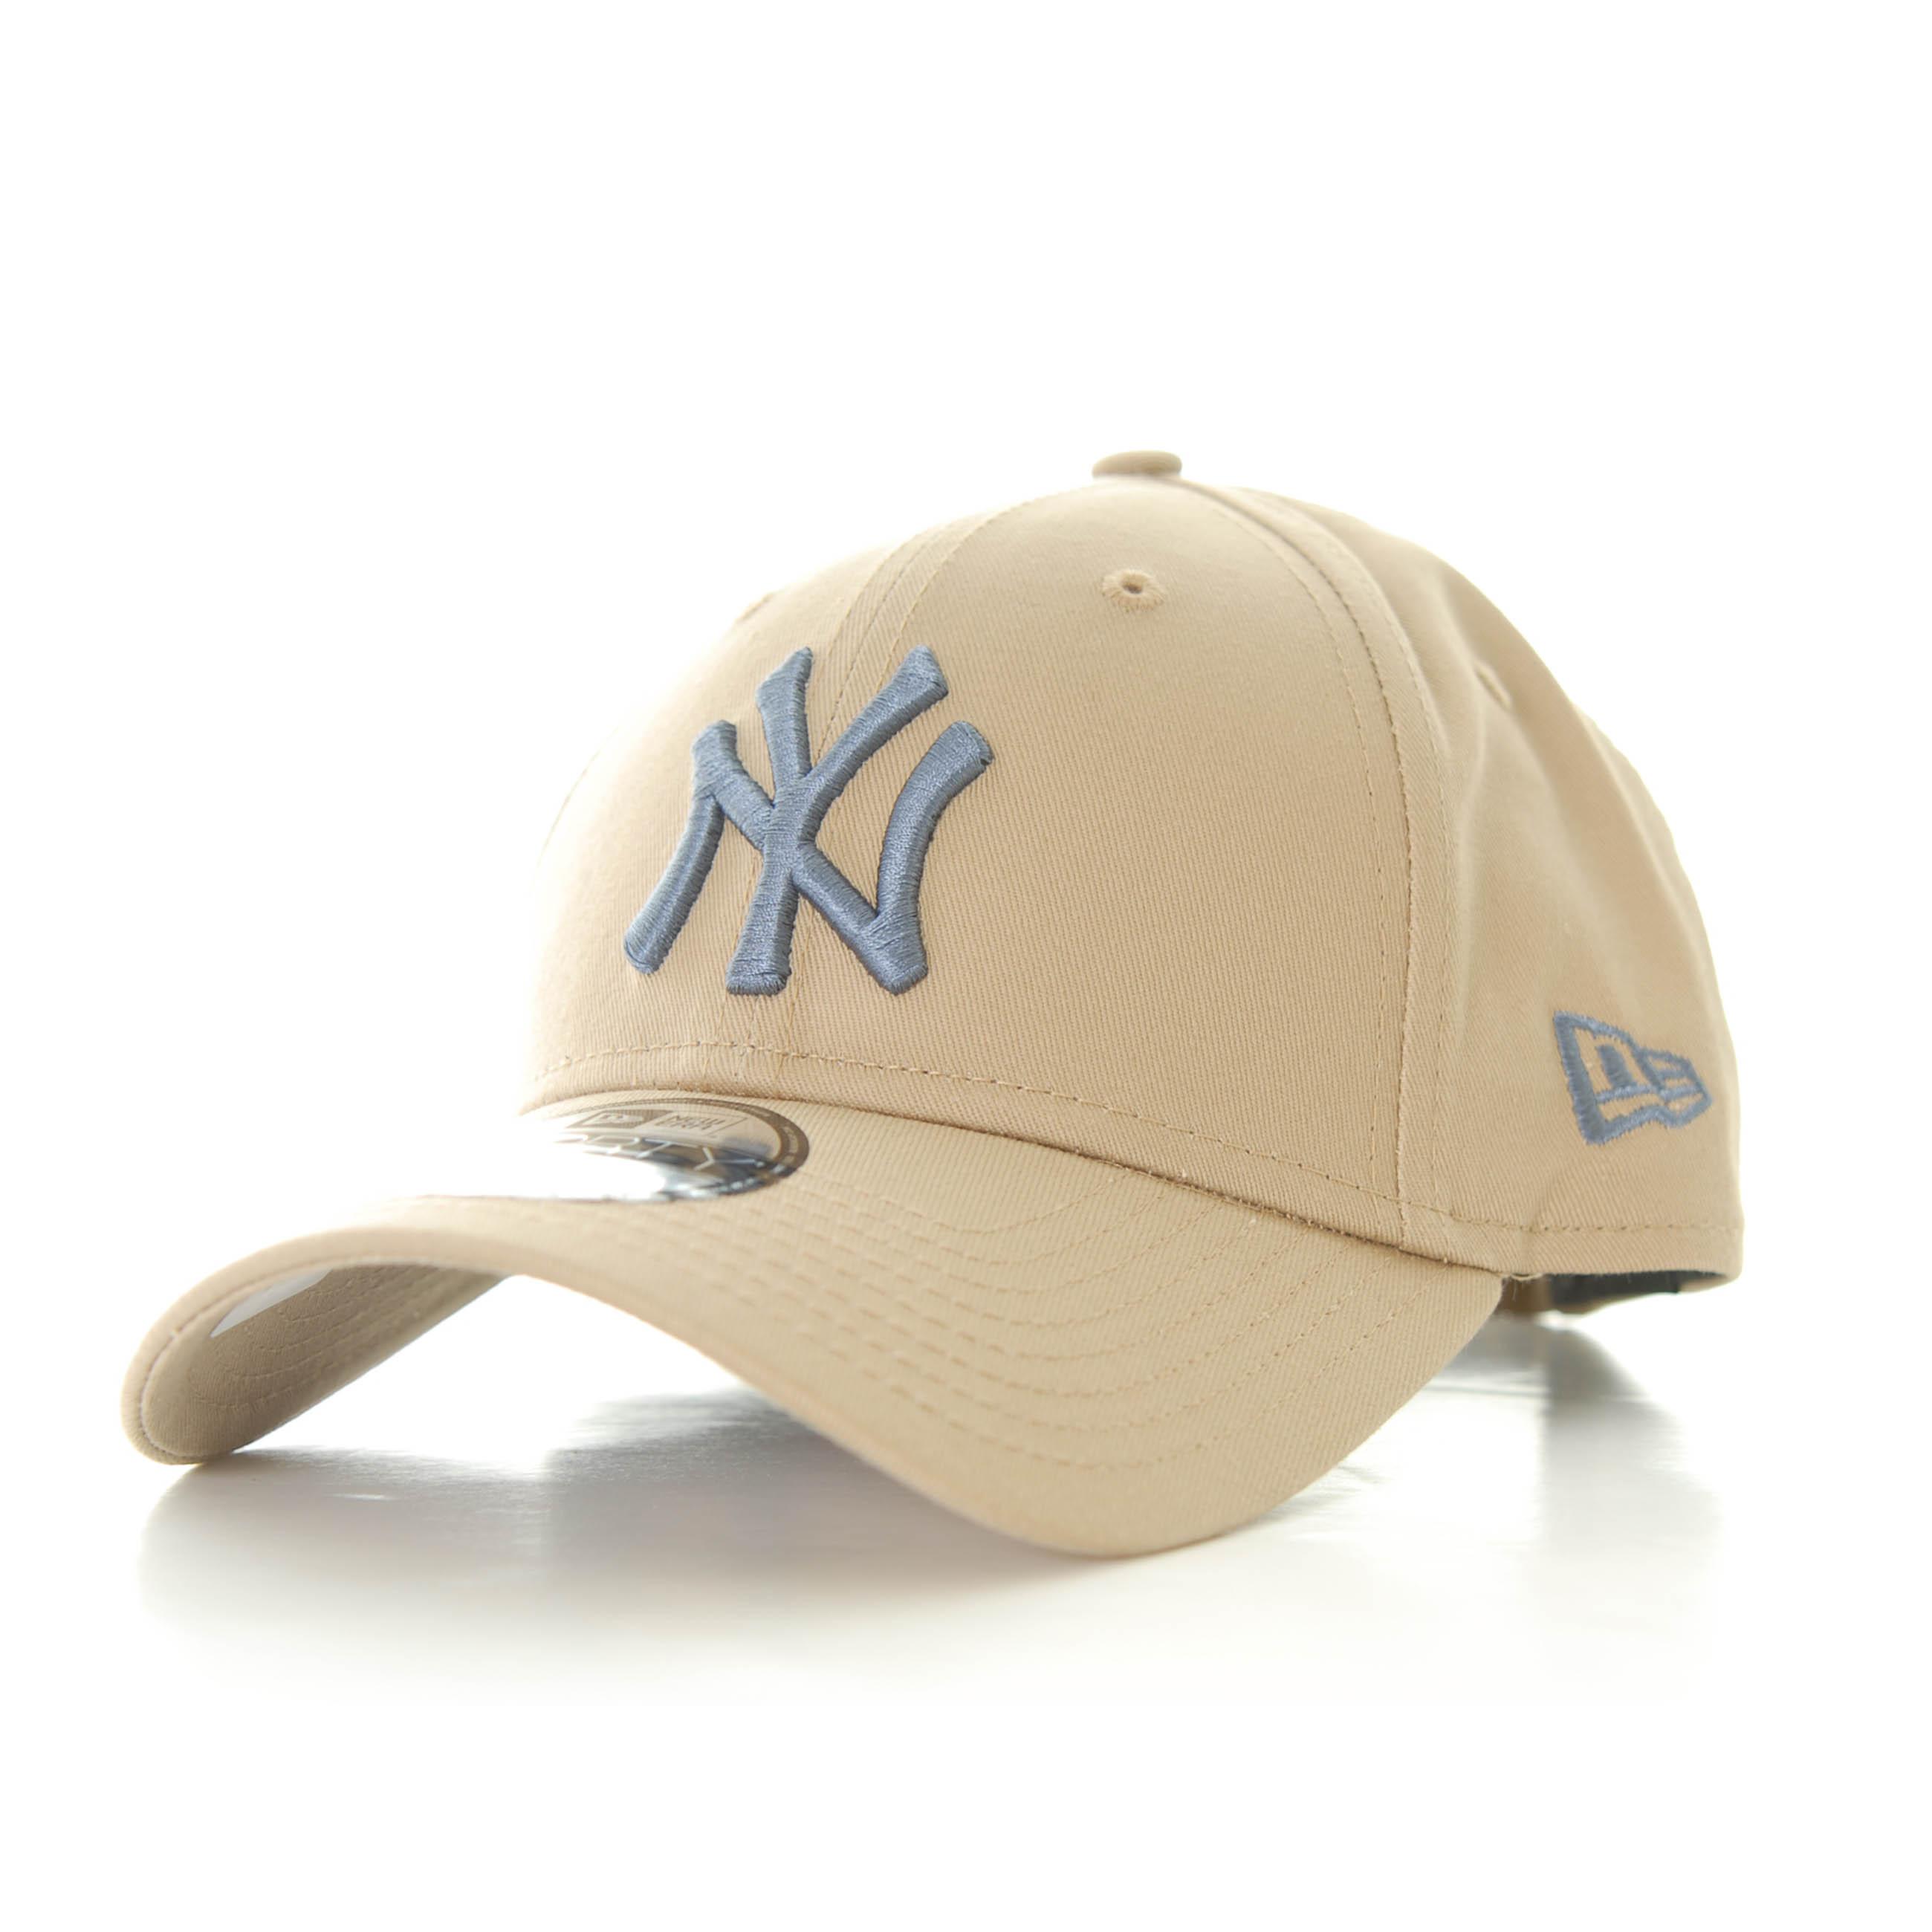 Details about New Era League Essential 9Forty New York Yankees Cap Camel  OSFA 9e75cf415e